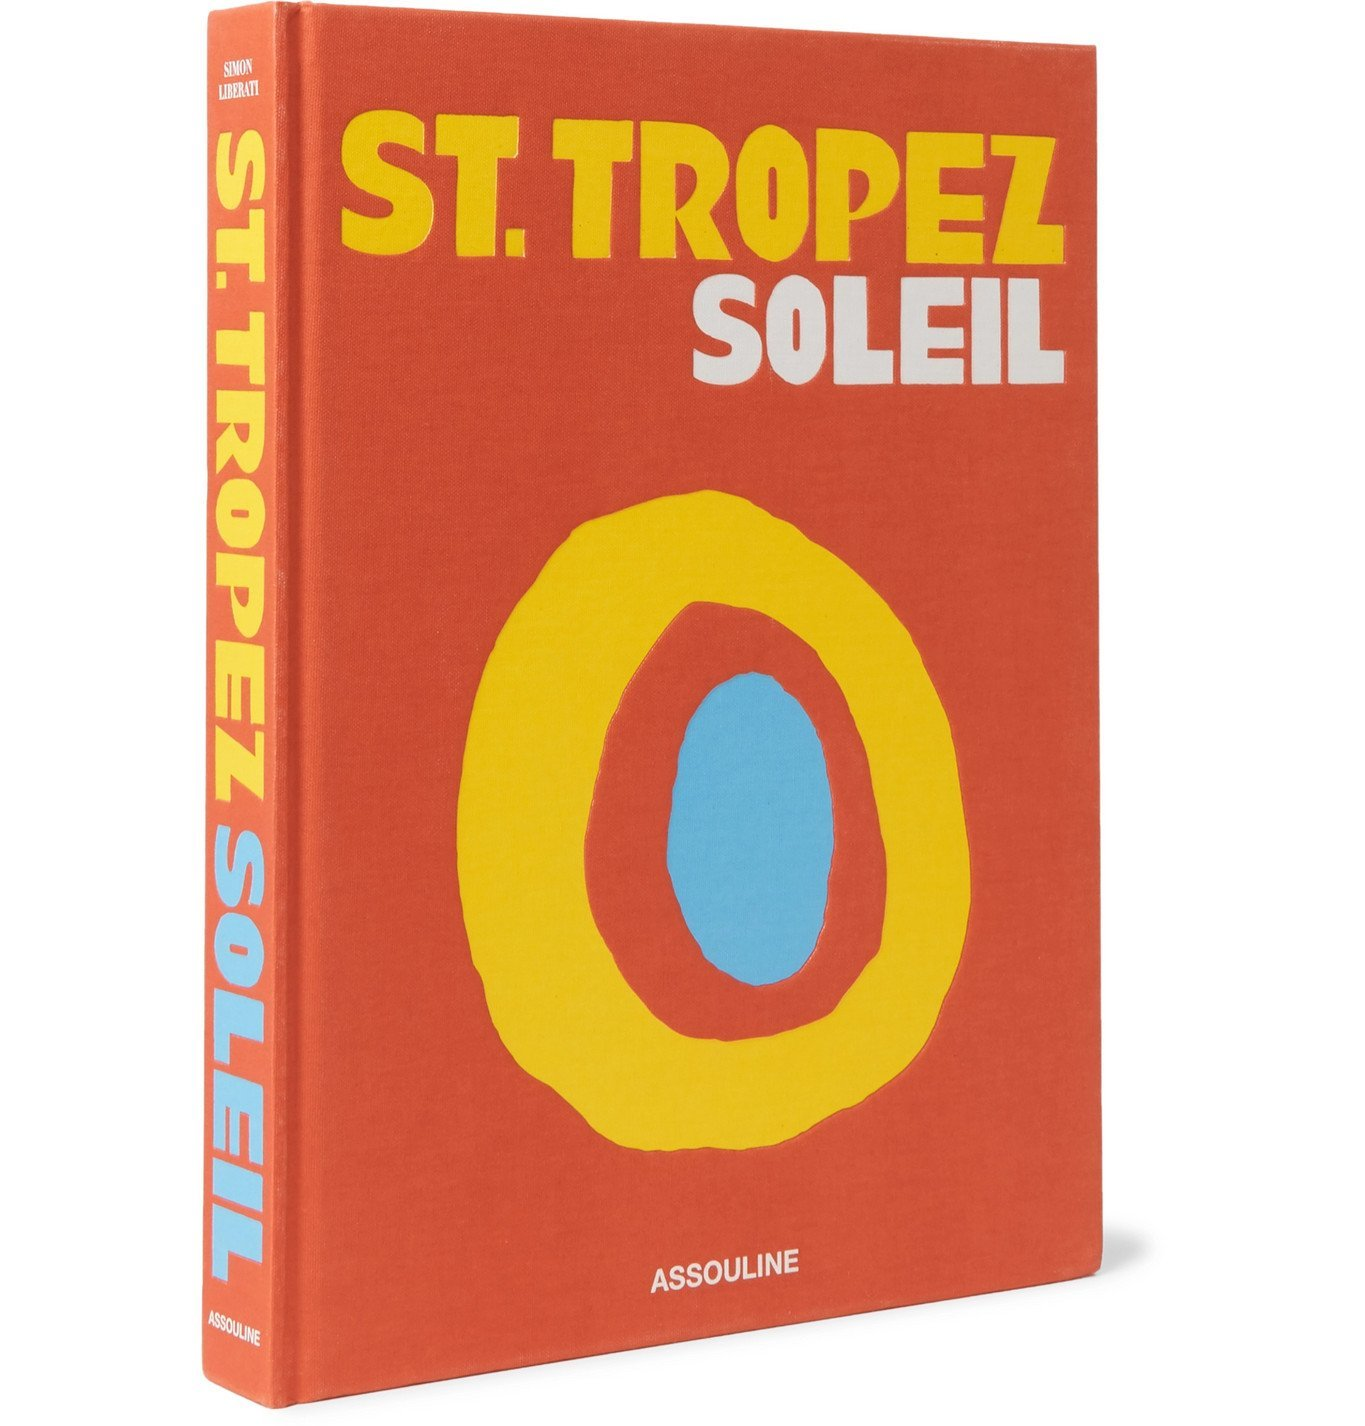 Assouline - St. Tropez Soleil Hardcover Book - Orange